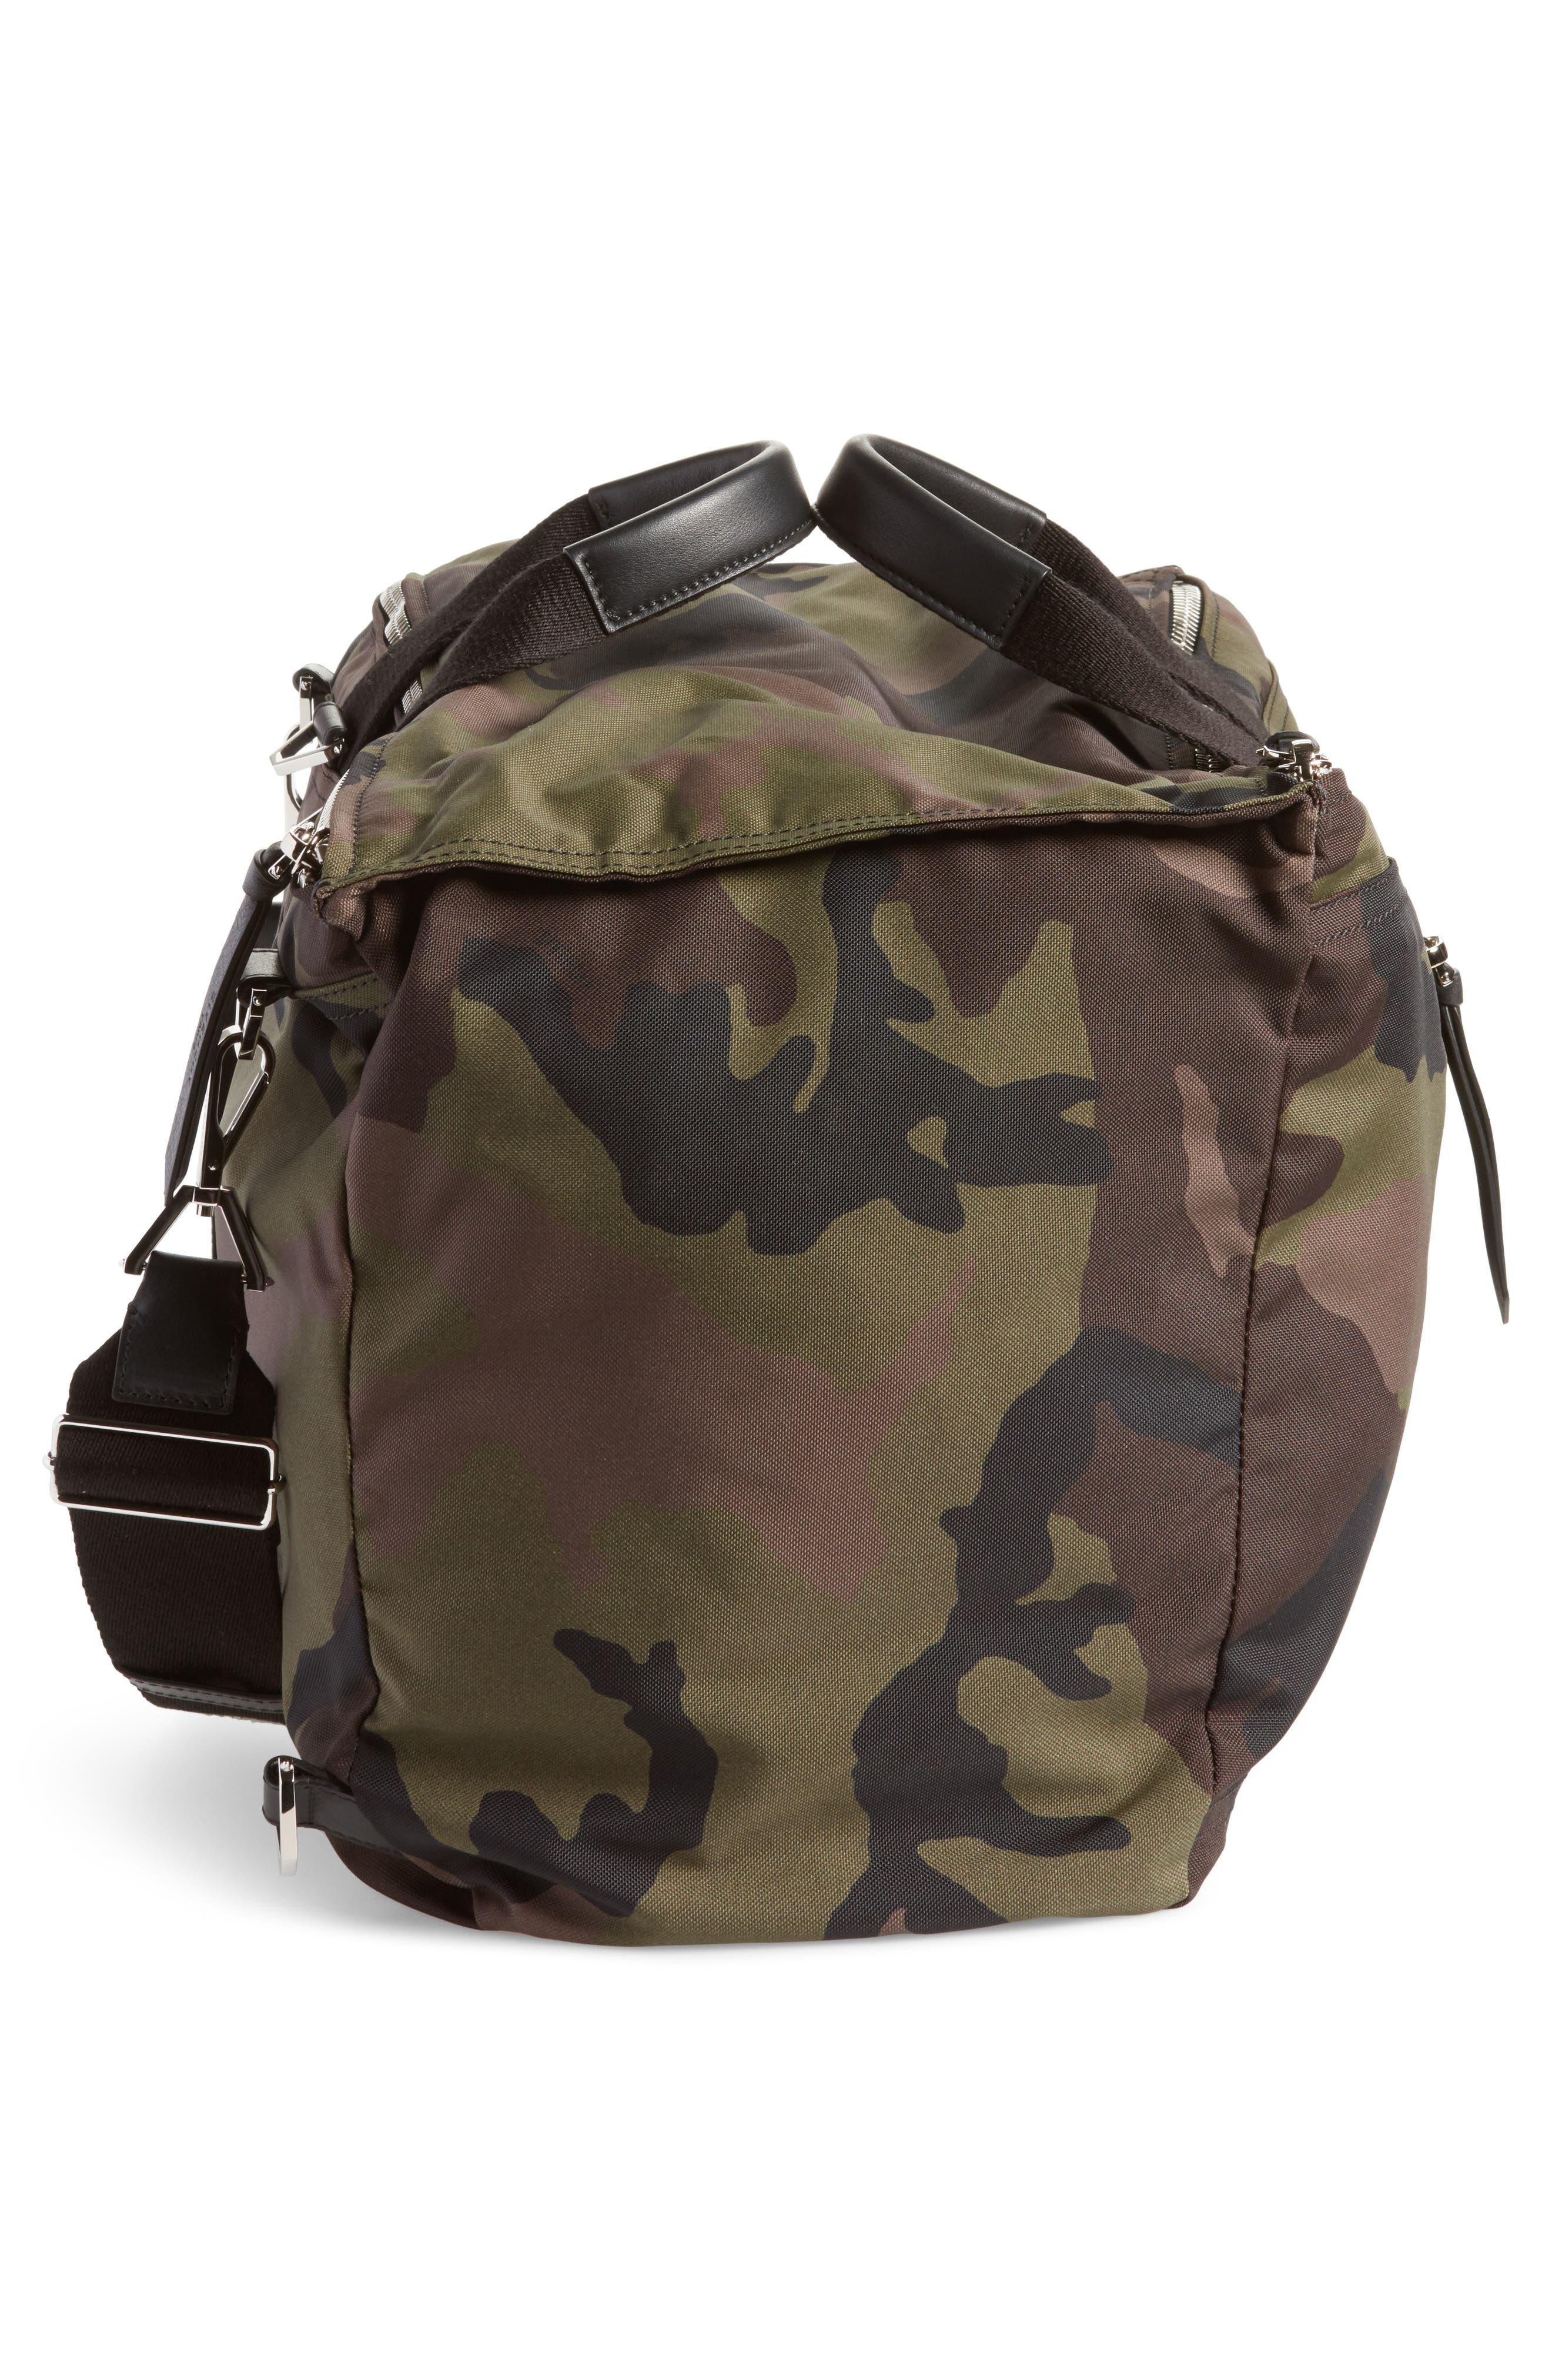 Pandora Camo Convertible Backpack,                             Alternate thumbnail 6, color,                             Multicolored